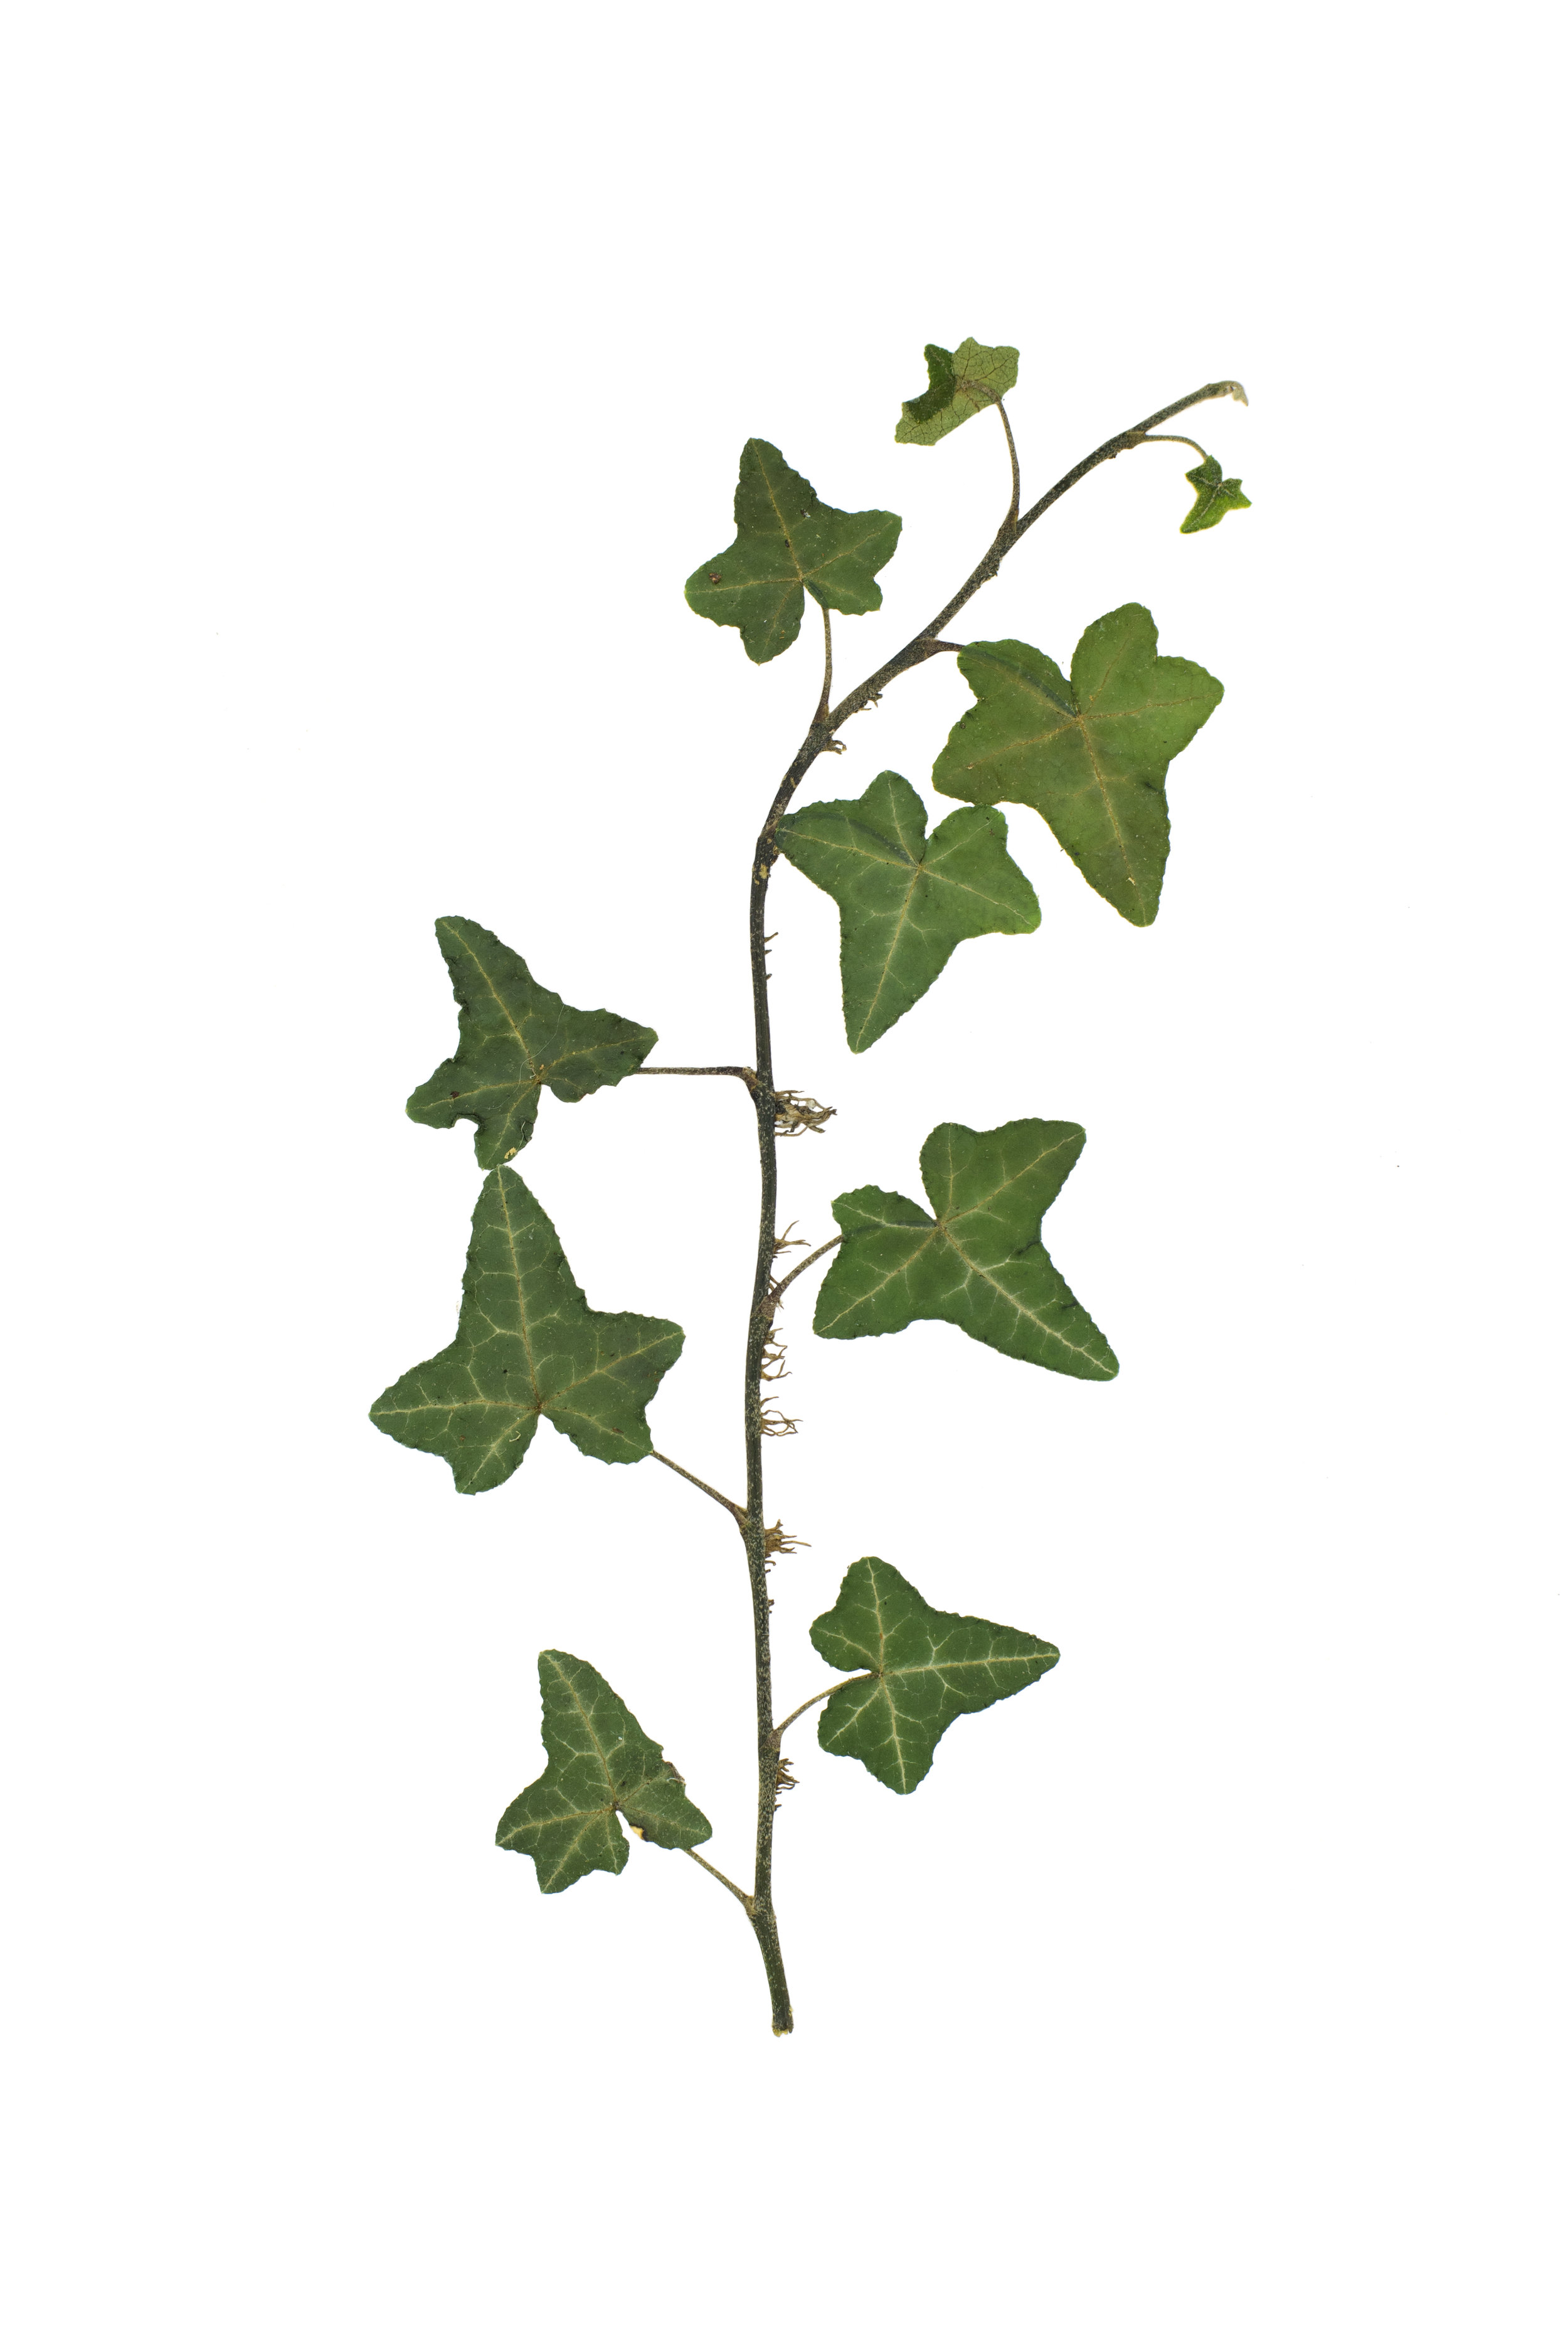 English Ivy / Hedera helix